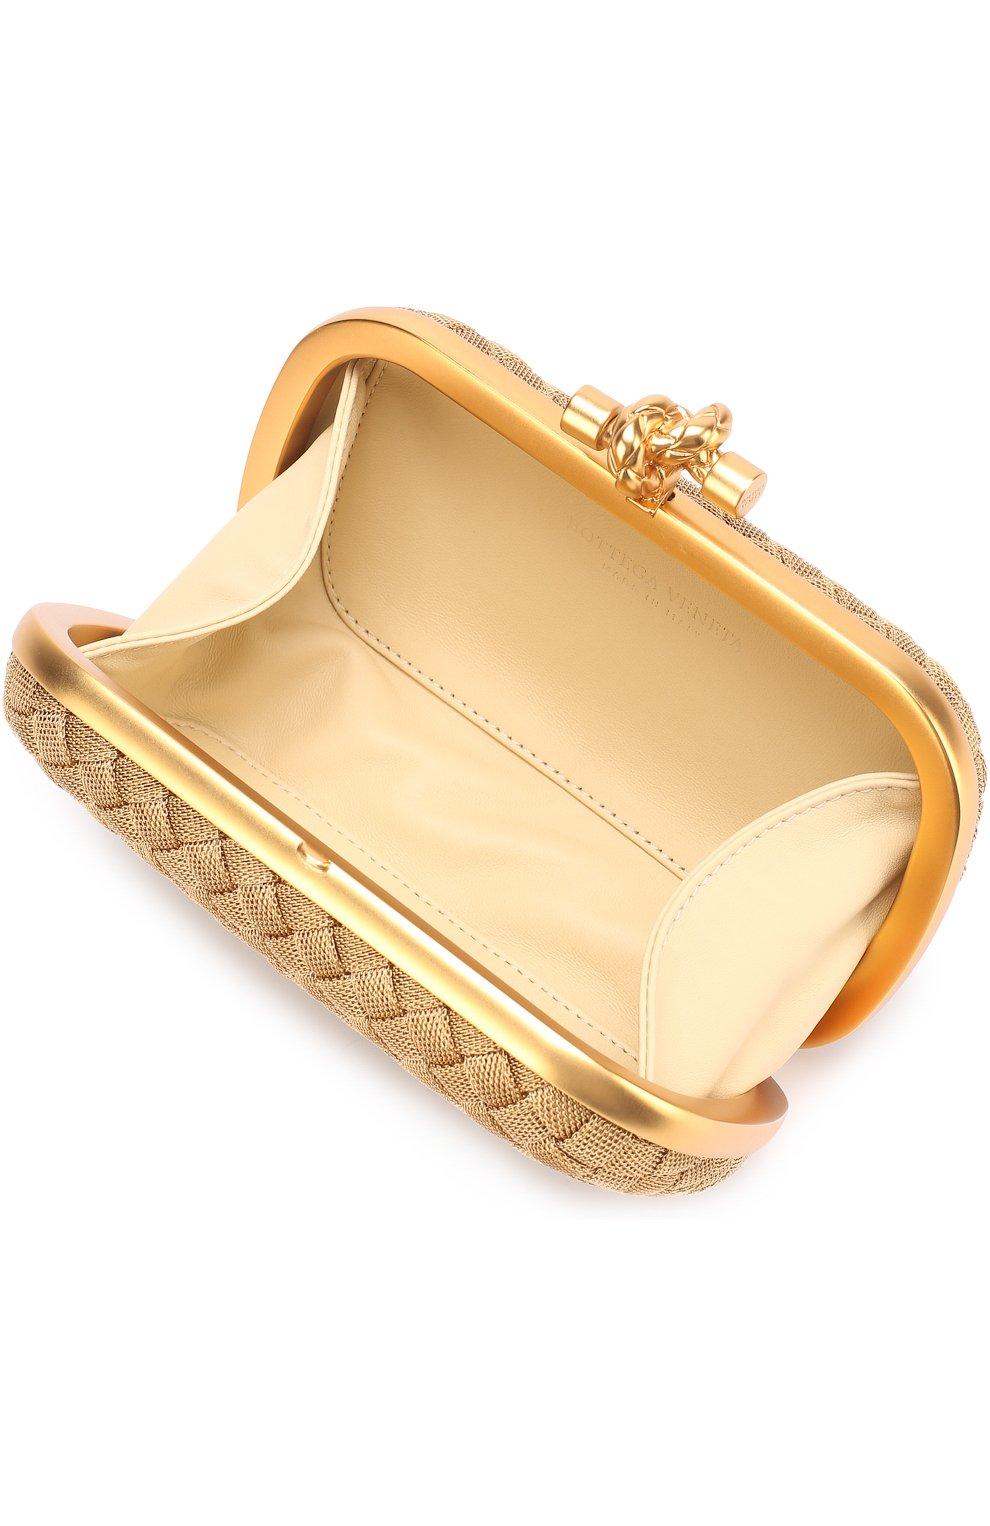 5ad3c556c4ef Клатч Knot из металла Bottega Veneta бронзового цвета | Фото №4